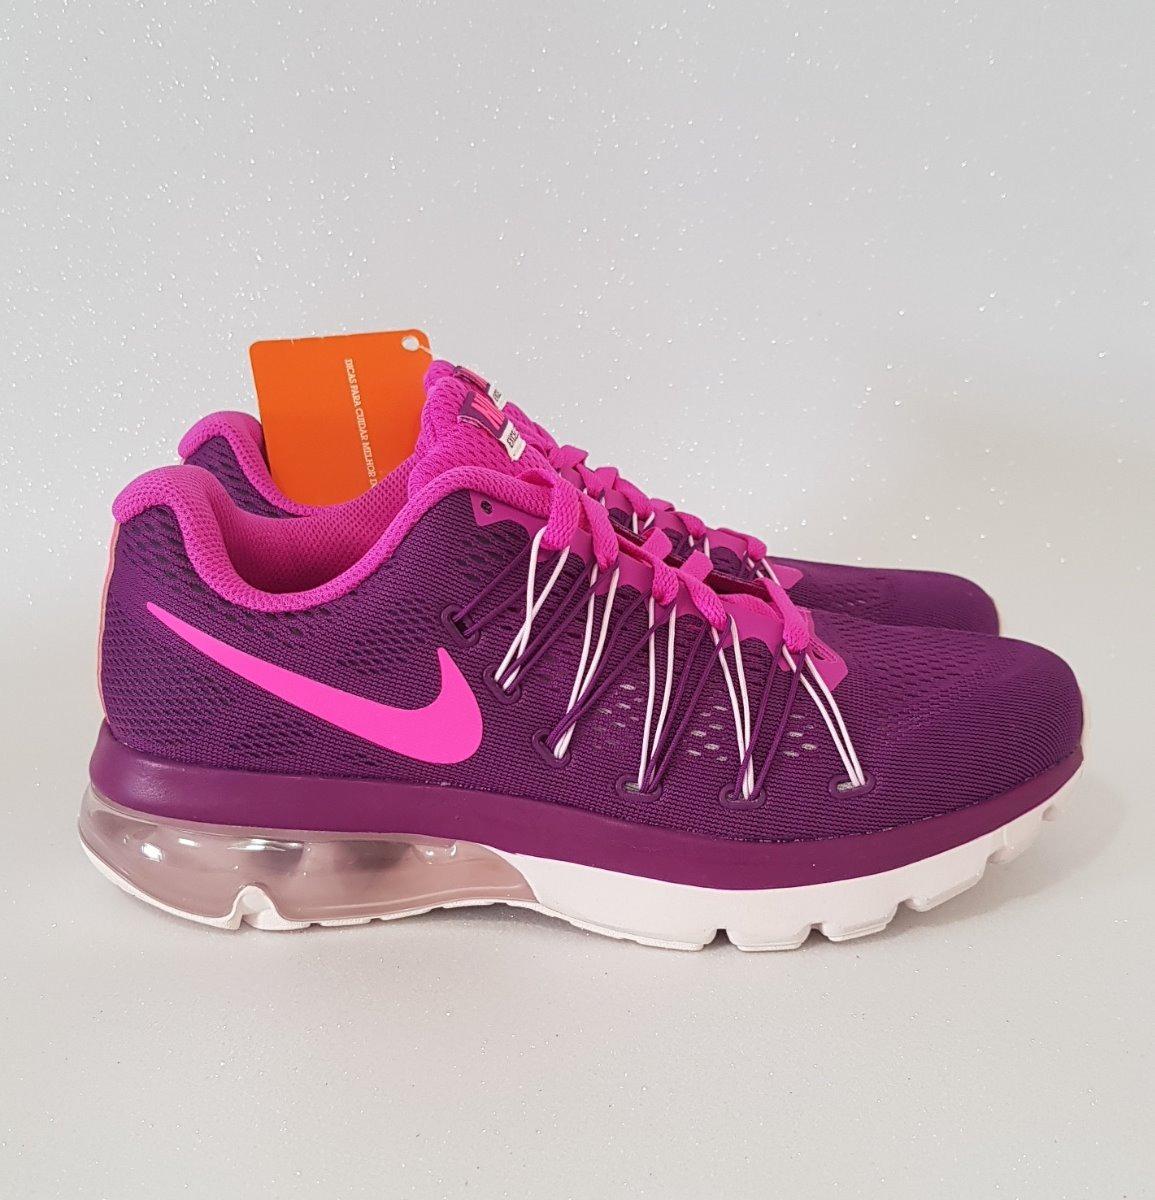 9243abb56 Tênis Nike Air Max Excellerate 5 Roxo Original - R$ 400,00 em ...